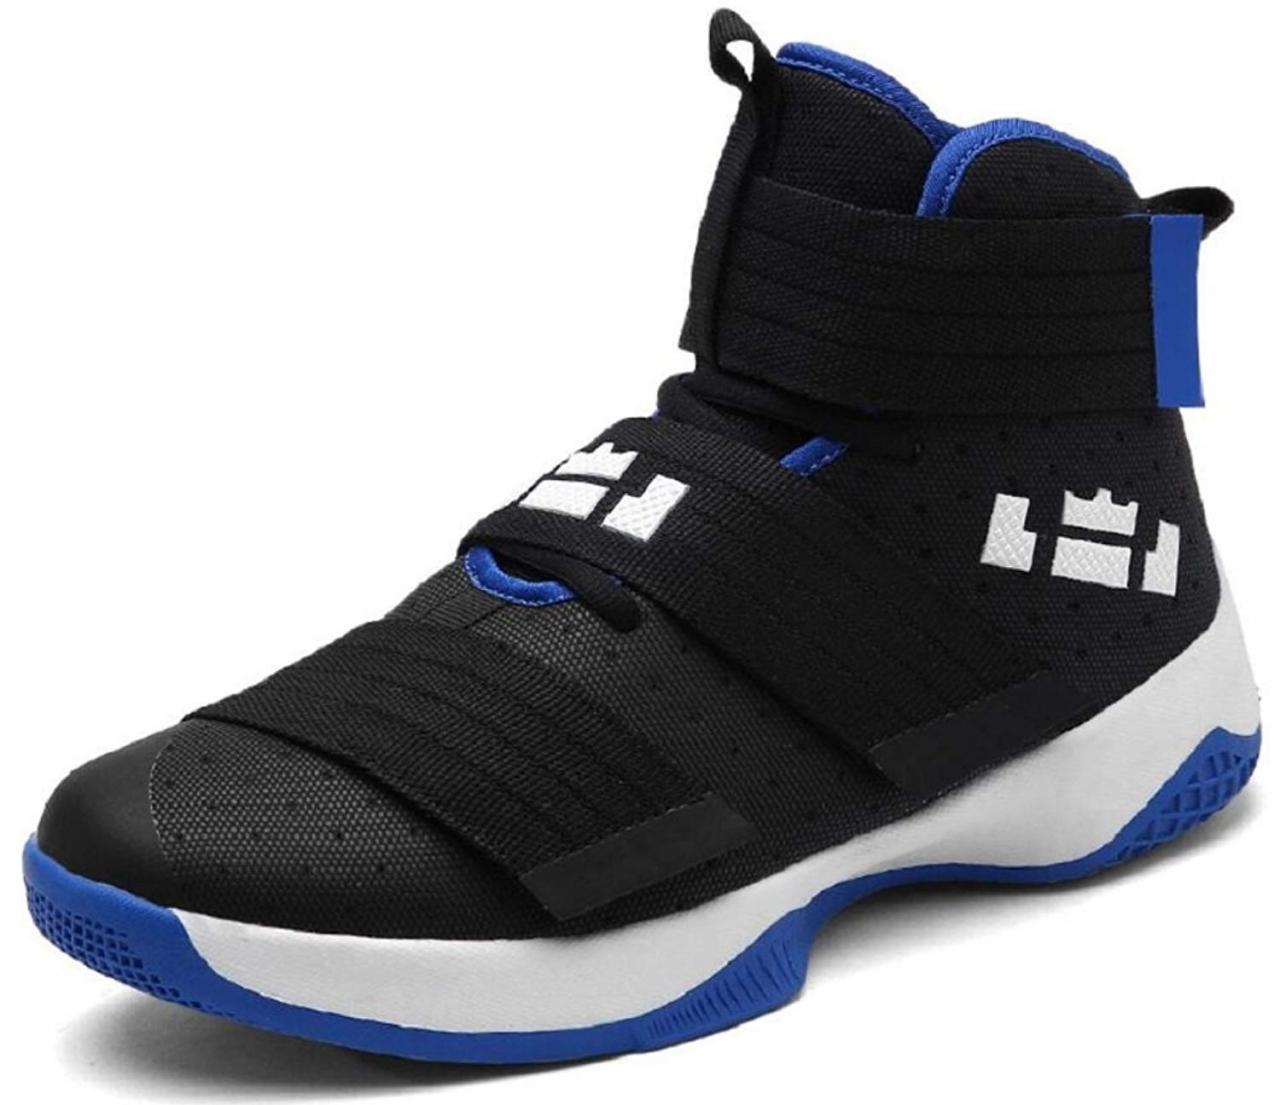 4237b69186709 Gagigakac Men's Basketball Shoes for Women's Performance Sports Velcro  Sneakers by Black Blue 39